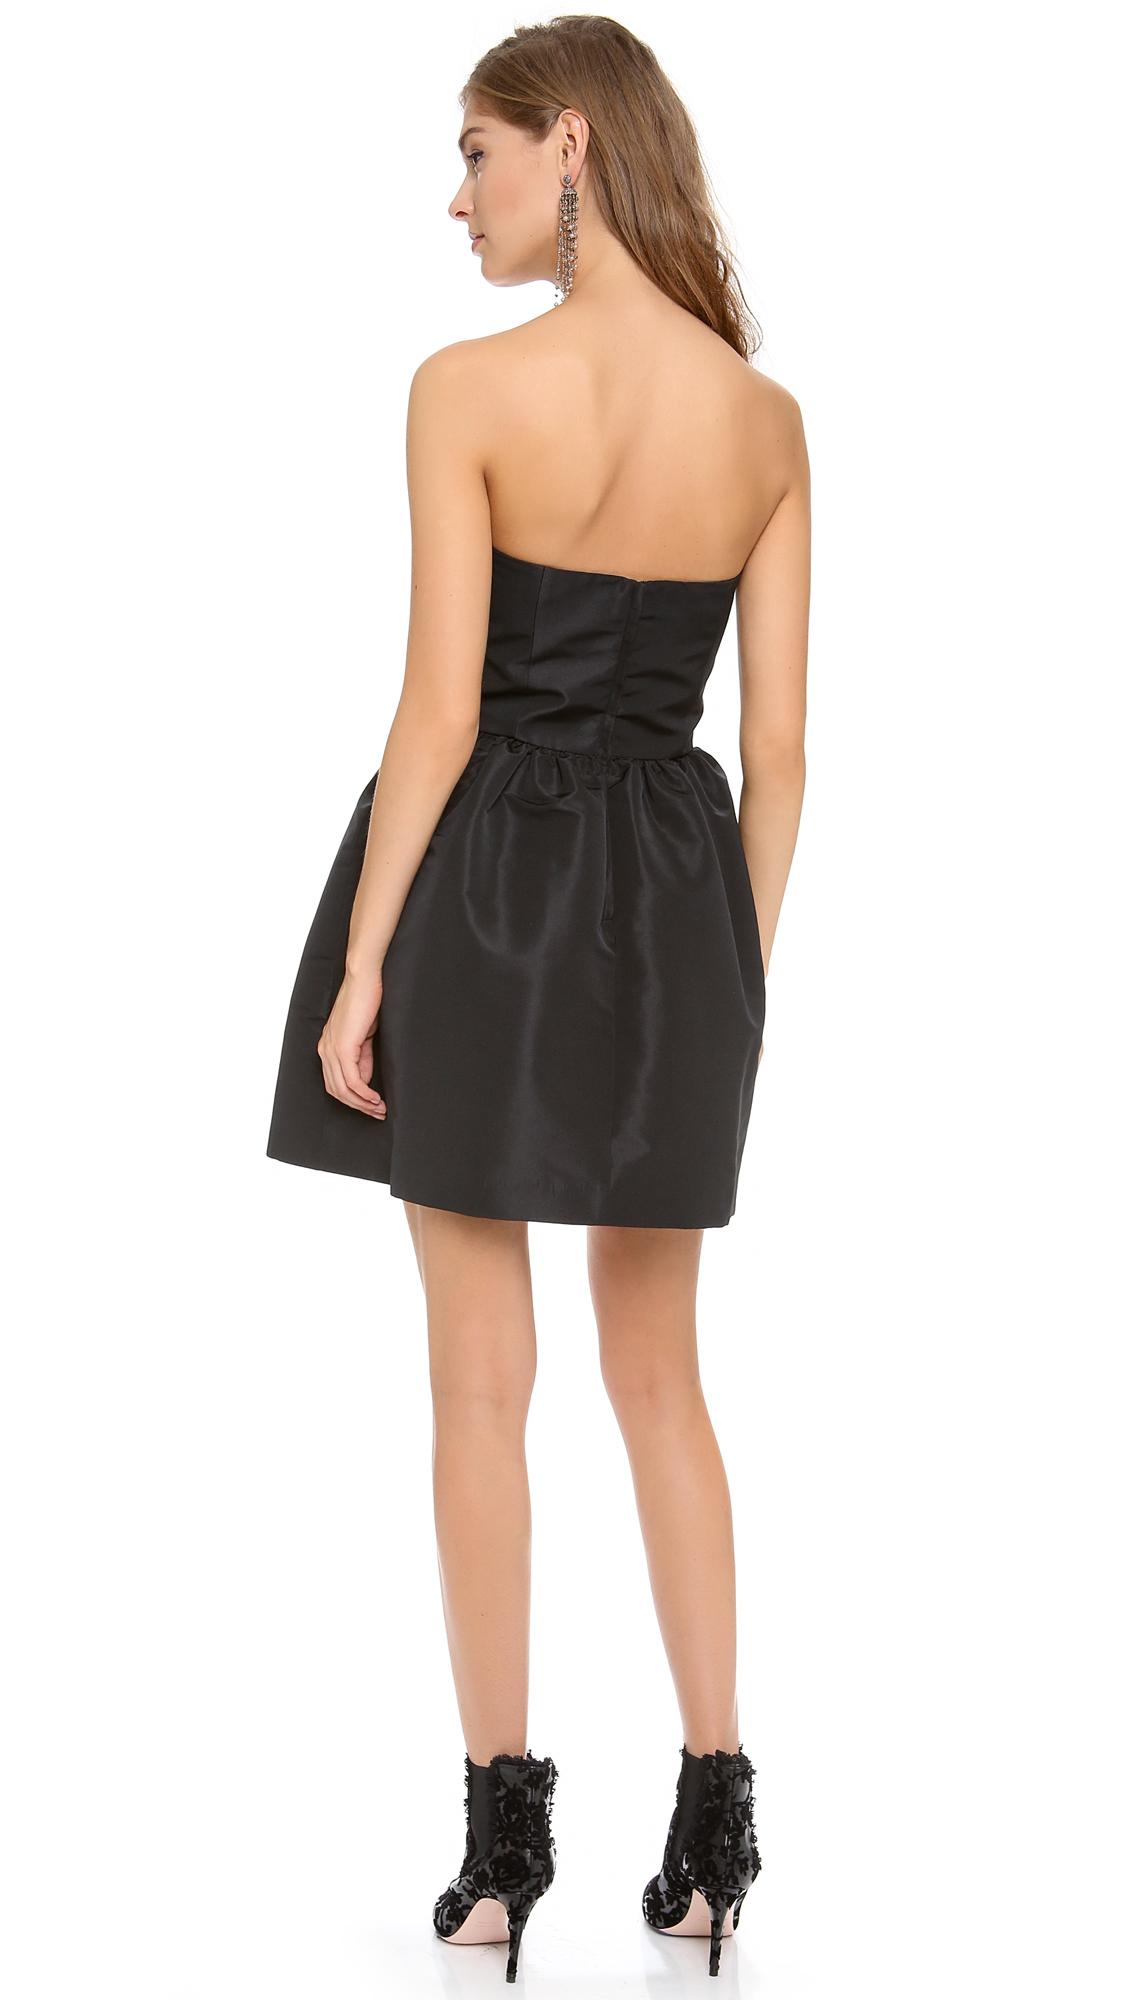 Red Valentino Strapless Bow Mini Dress In Black Lyst